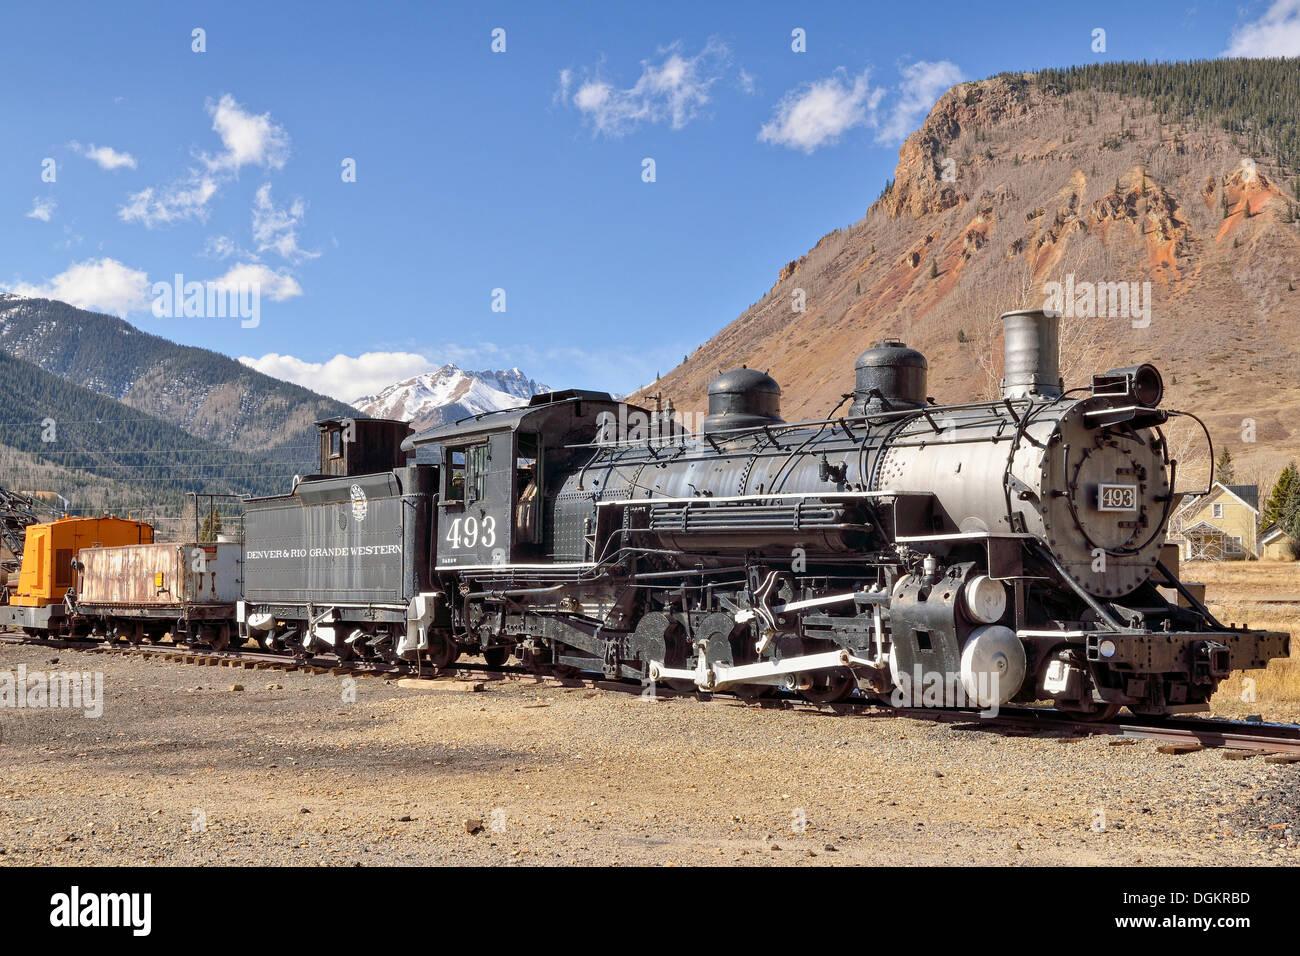 Historic train with a steam locomotive, Denver & Rio Grande Western Railroad Company, silver mining town of Silverton, Colorado - Stock Image